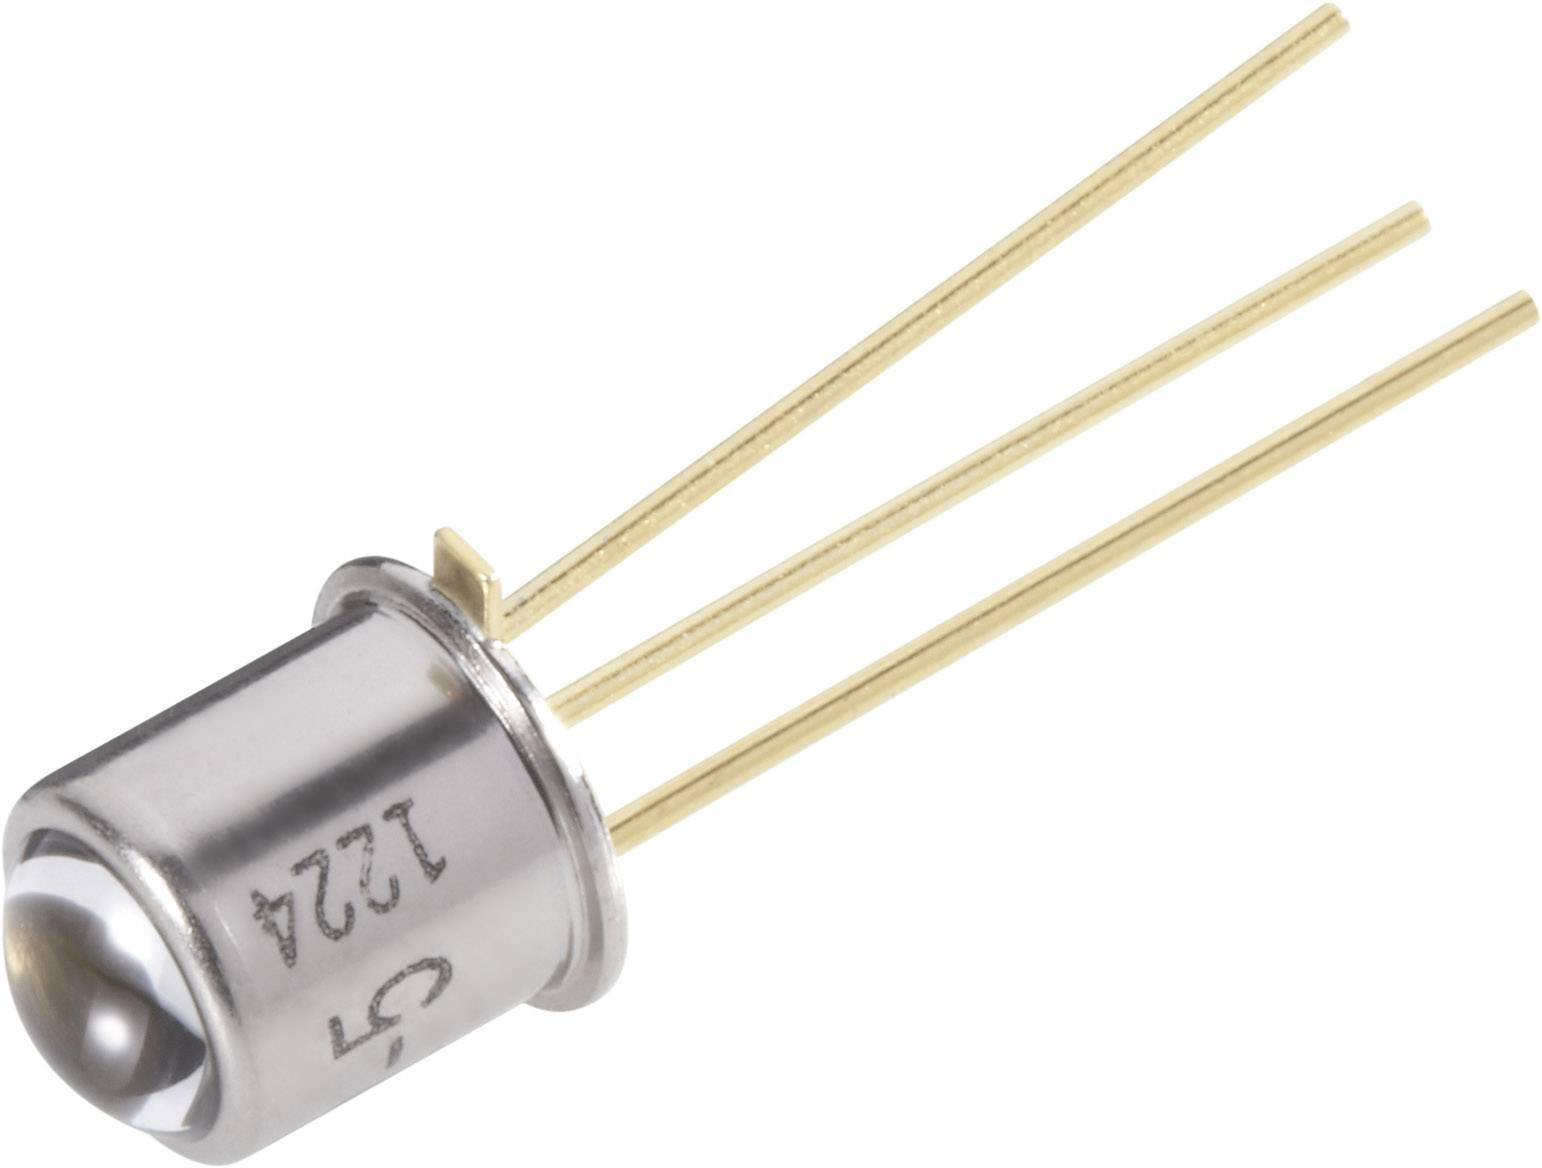 Fototranzistor Osram Components, BPY 62, 1130 nm, 8 °